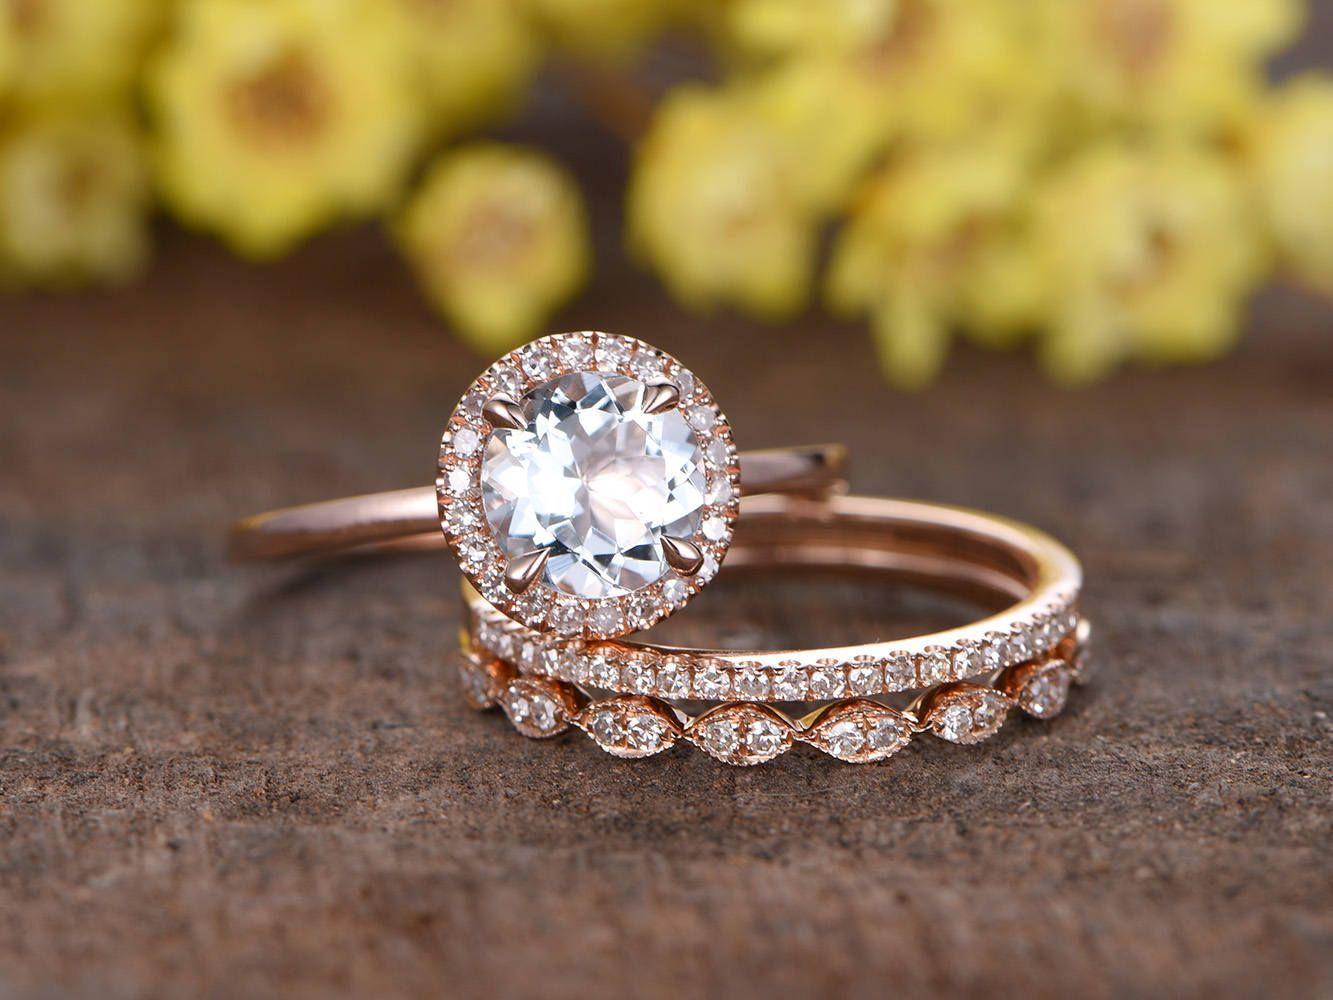 2be652e6984b90 6.5mm round cut 1ctw VS Aquamarine engagement ring set,3pcs diamond rings,solid  14K rose gold,Deco half eternity diamond band,marquise style